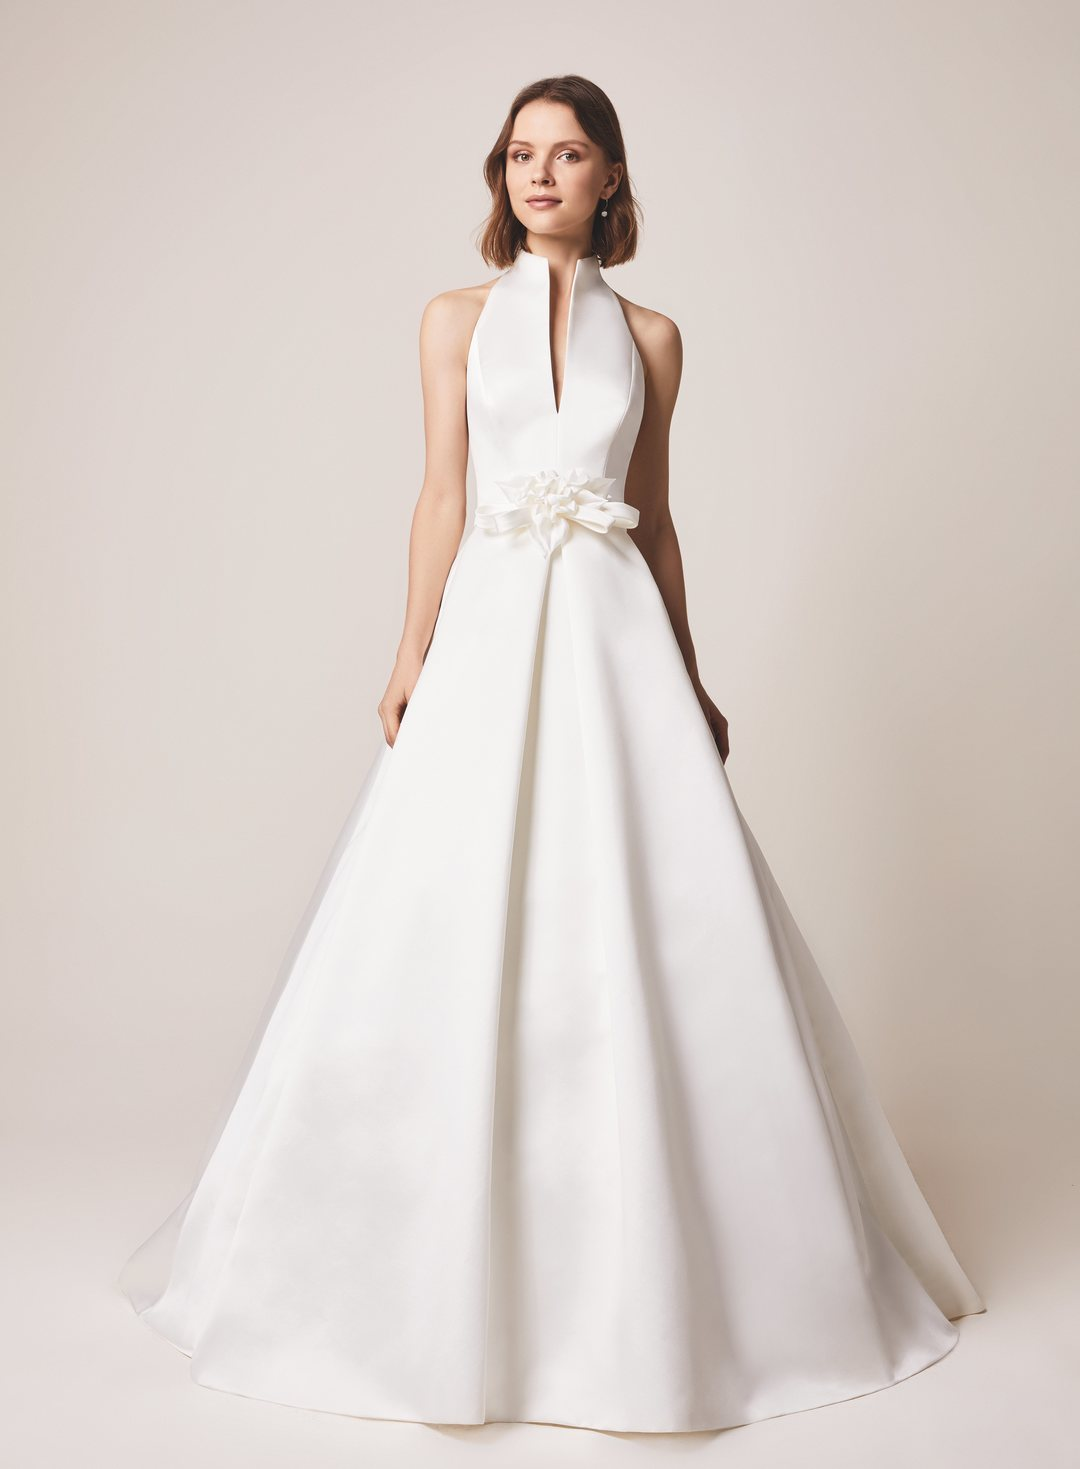 150 dress photo